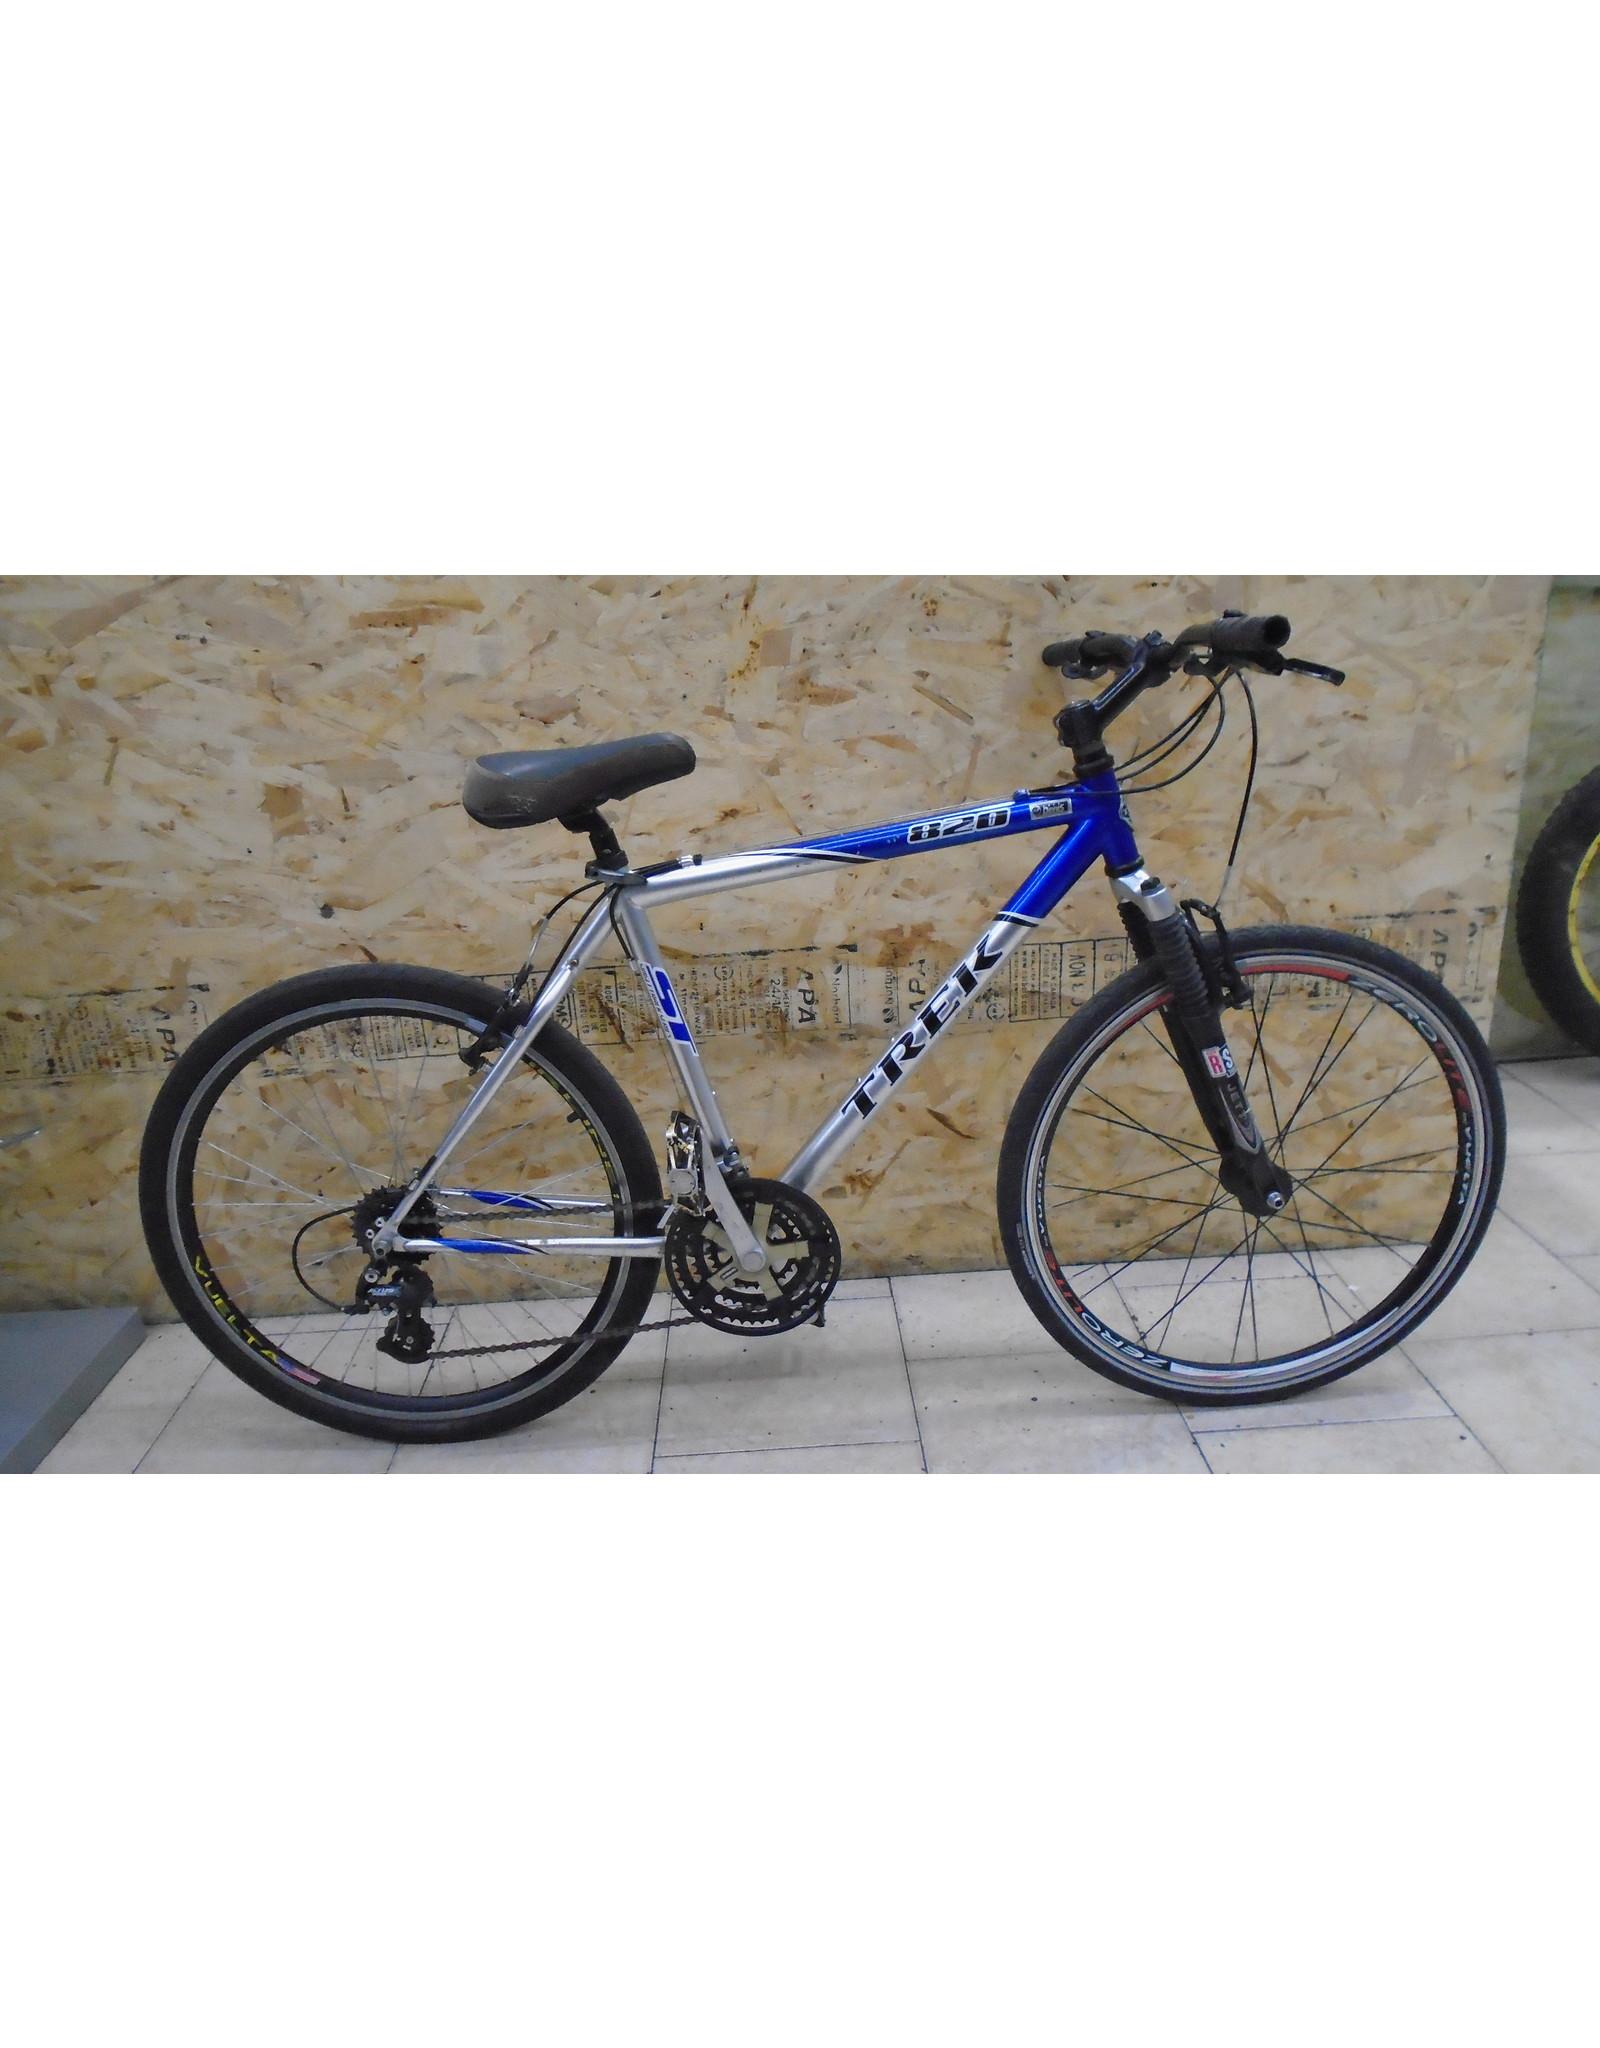 "Vélo usagé de montagne Trek 19"" - 10321"